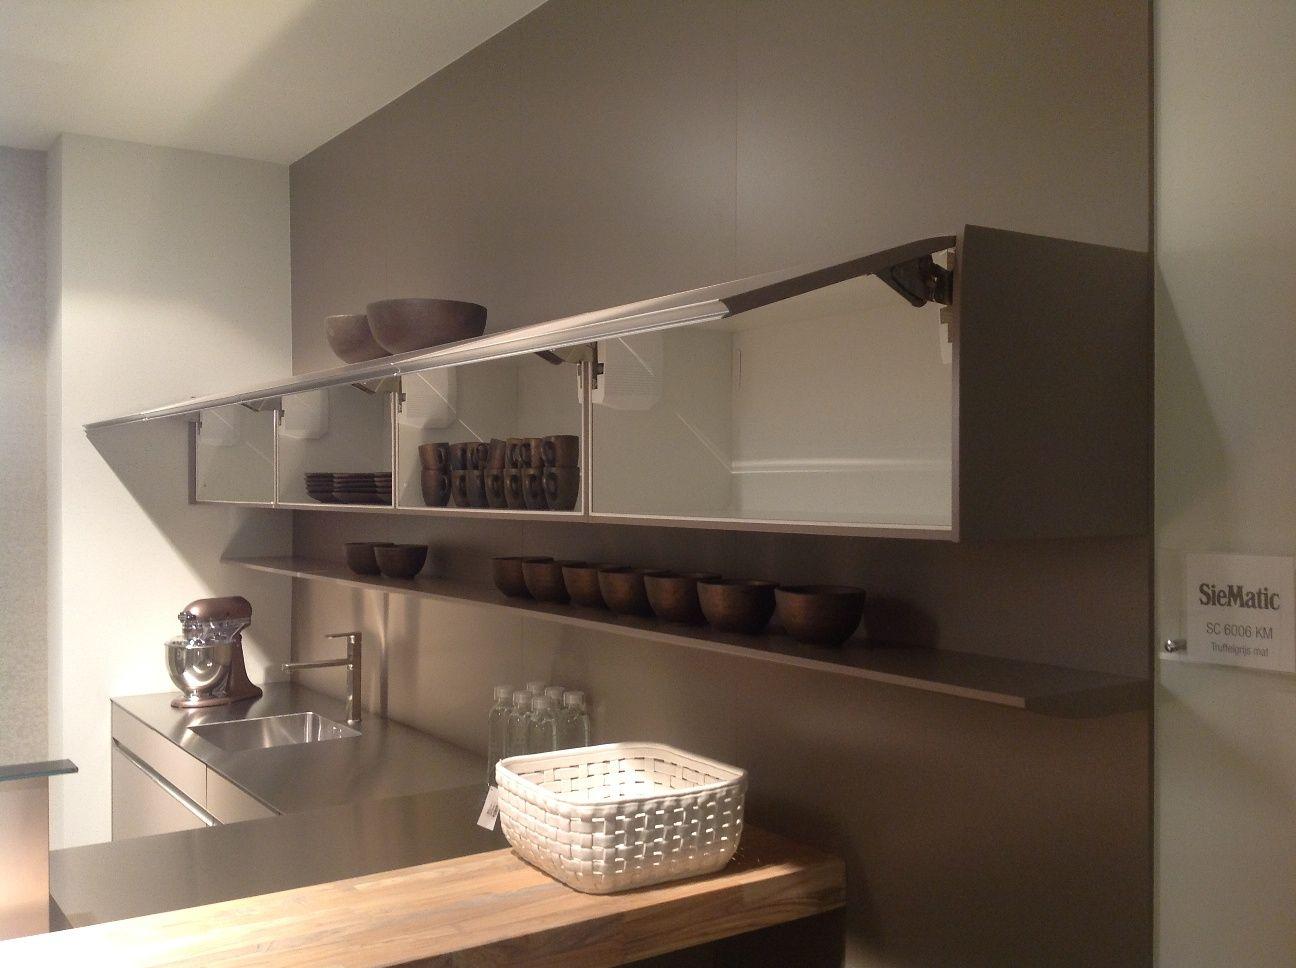 Allergrootste keukensite van nederland siematic luxe designkeuken greeploos - Afbeelding van keuken amenagee ...